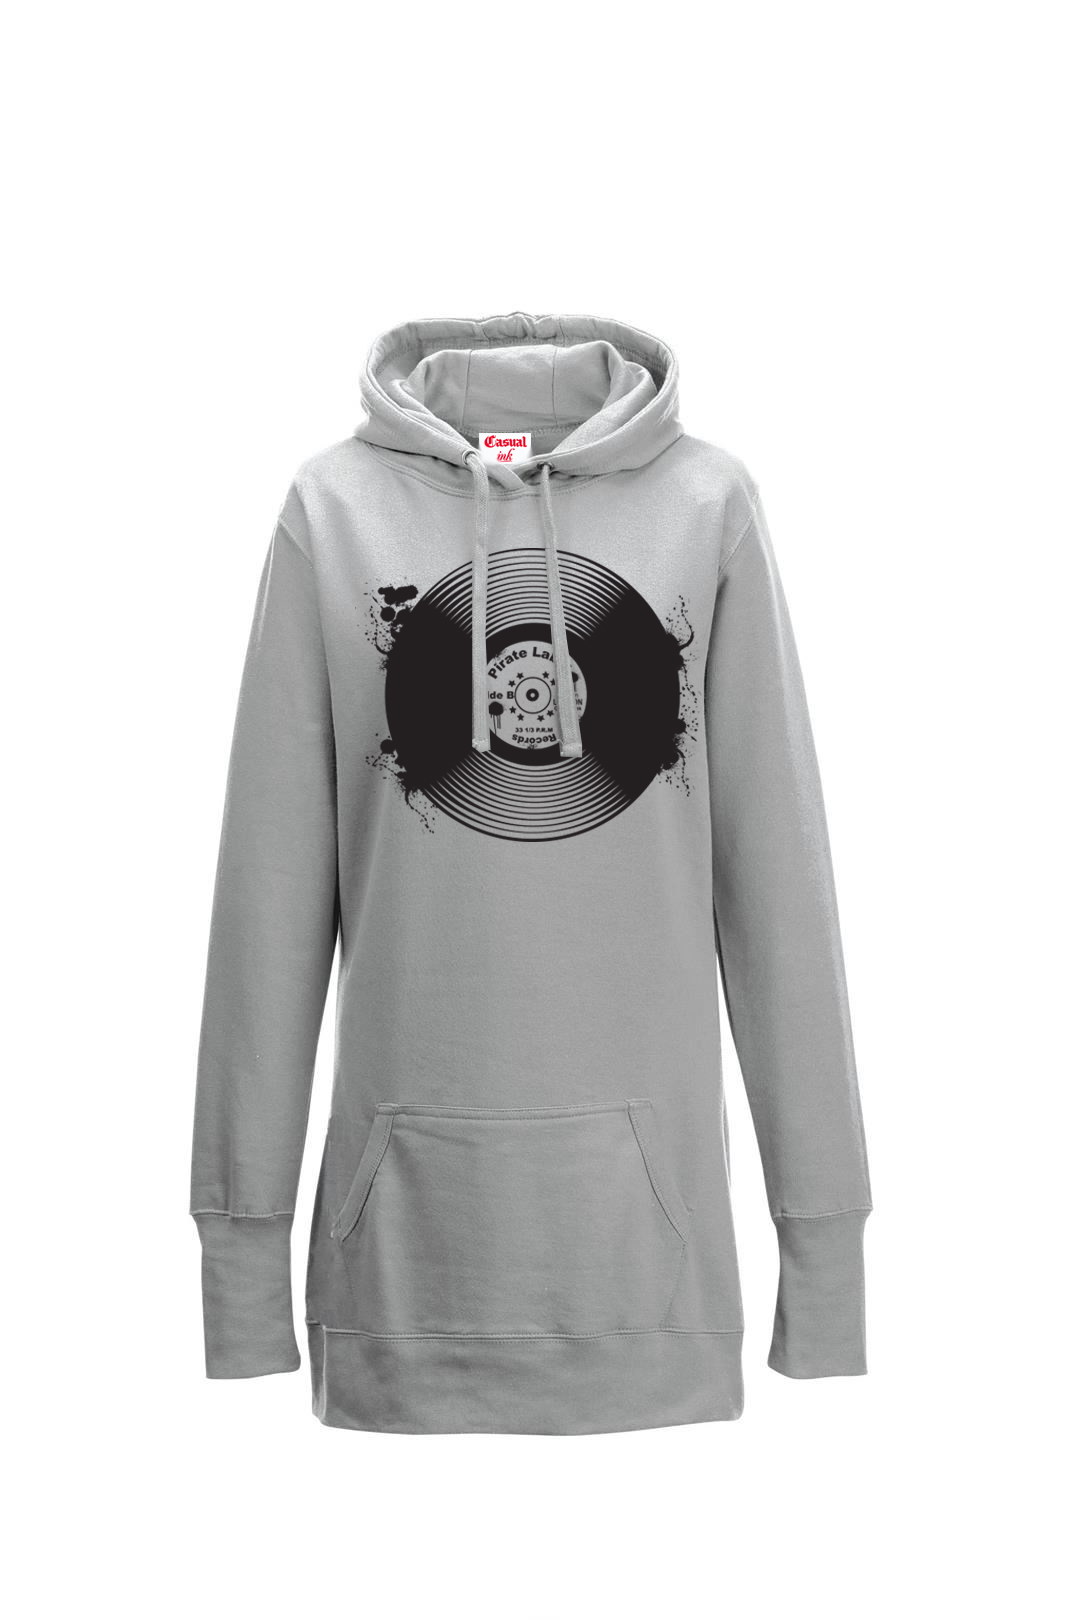 record long hoodie womens